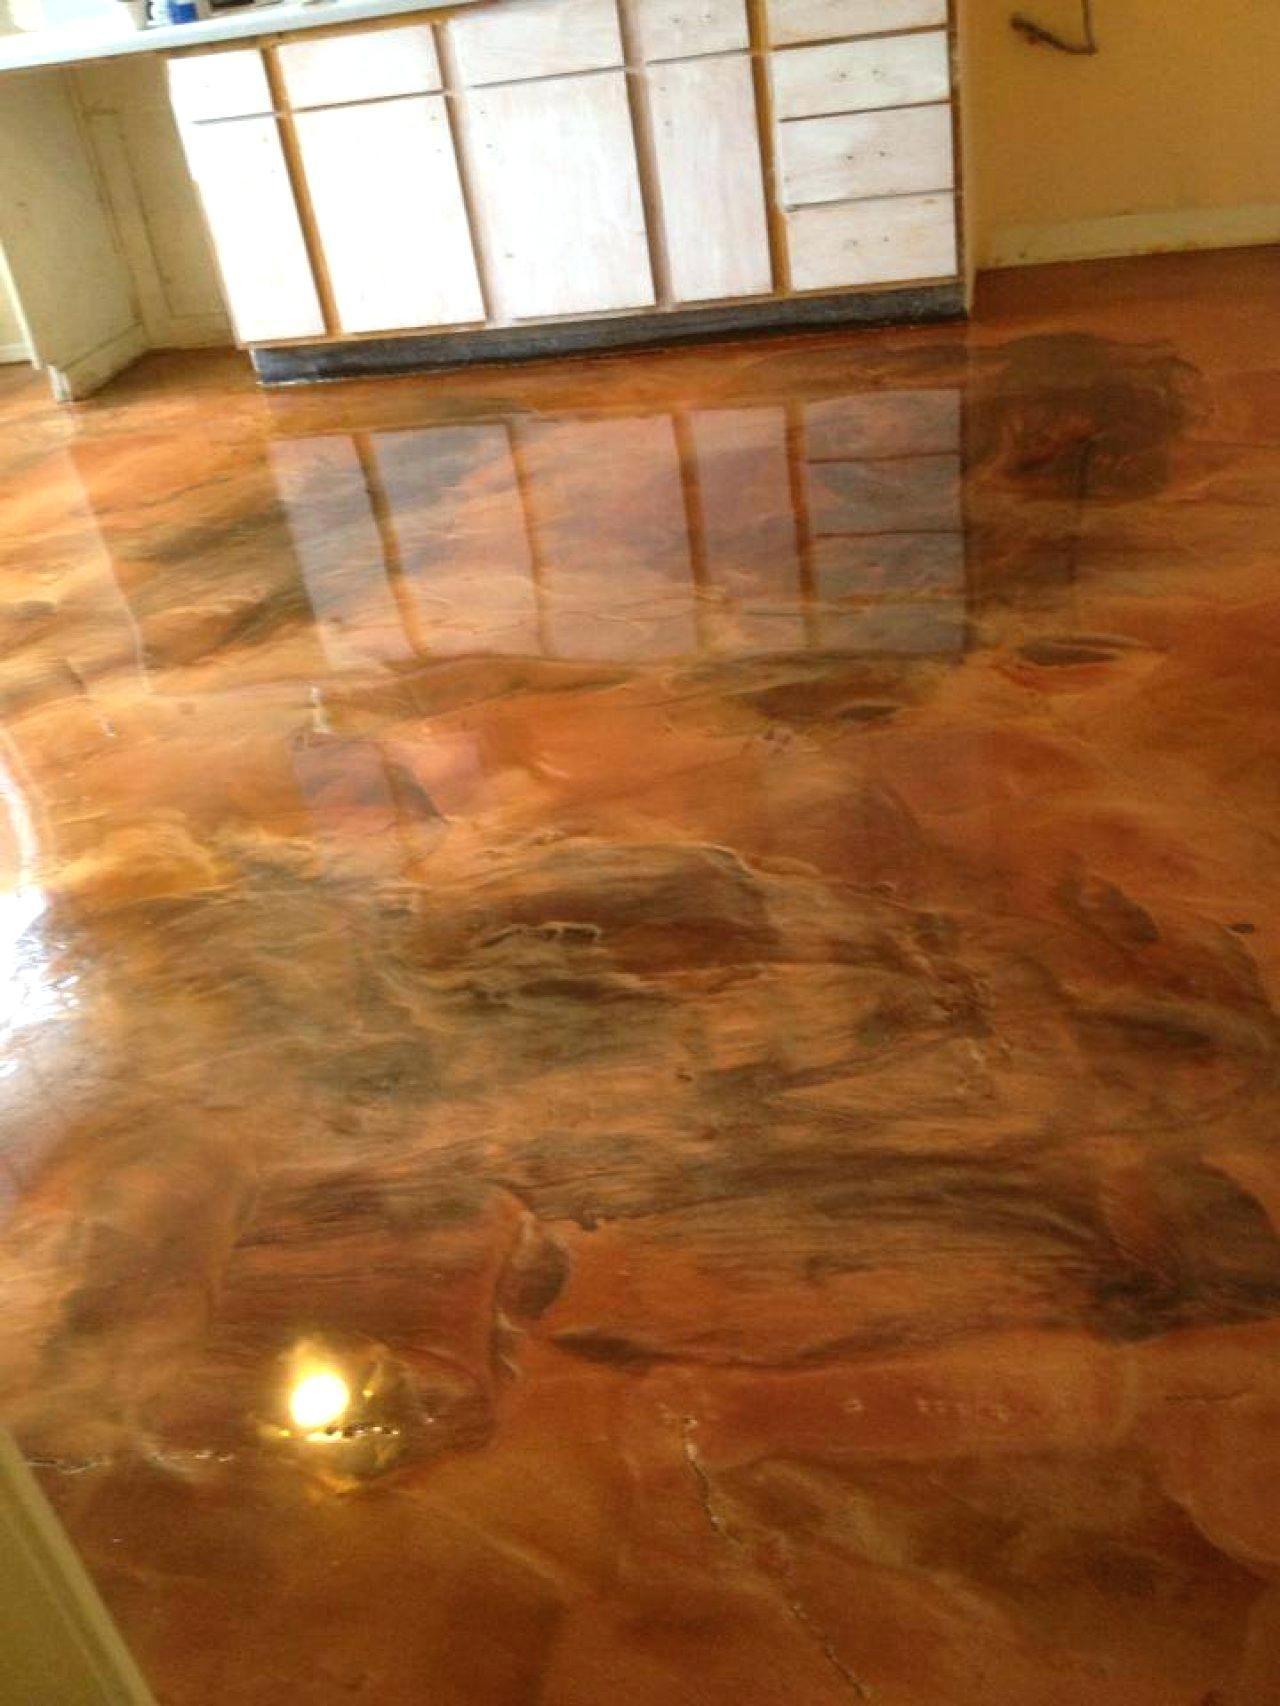 Self Leveling Epoxy For Wood Floors Concrete Decor Concrete Stained Floors Flooring